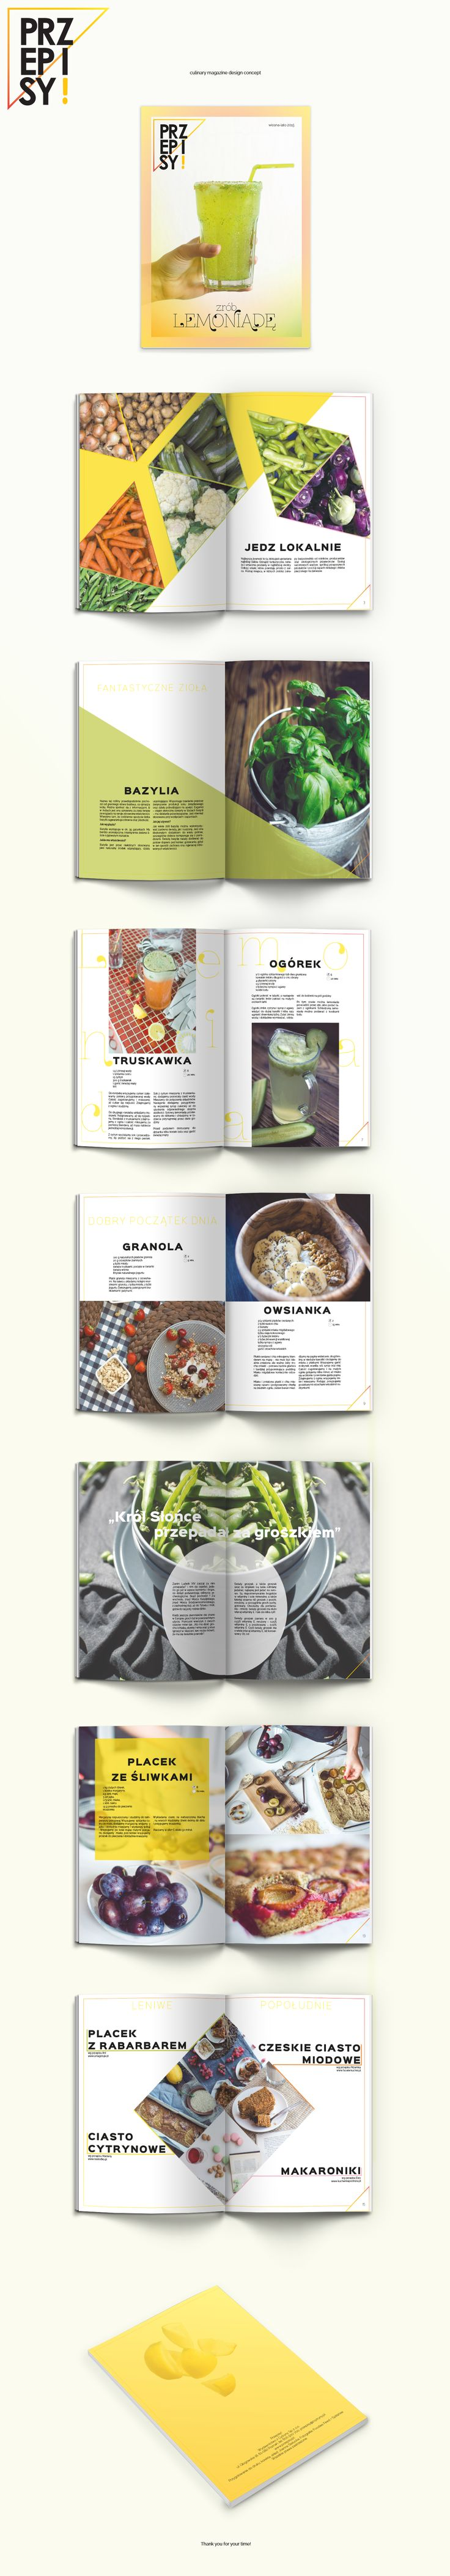 Culinary magazine design concept on Behance